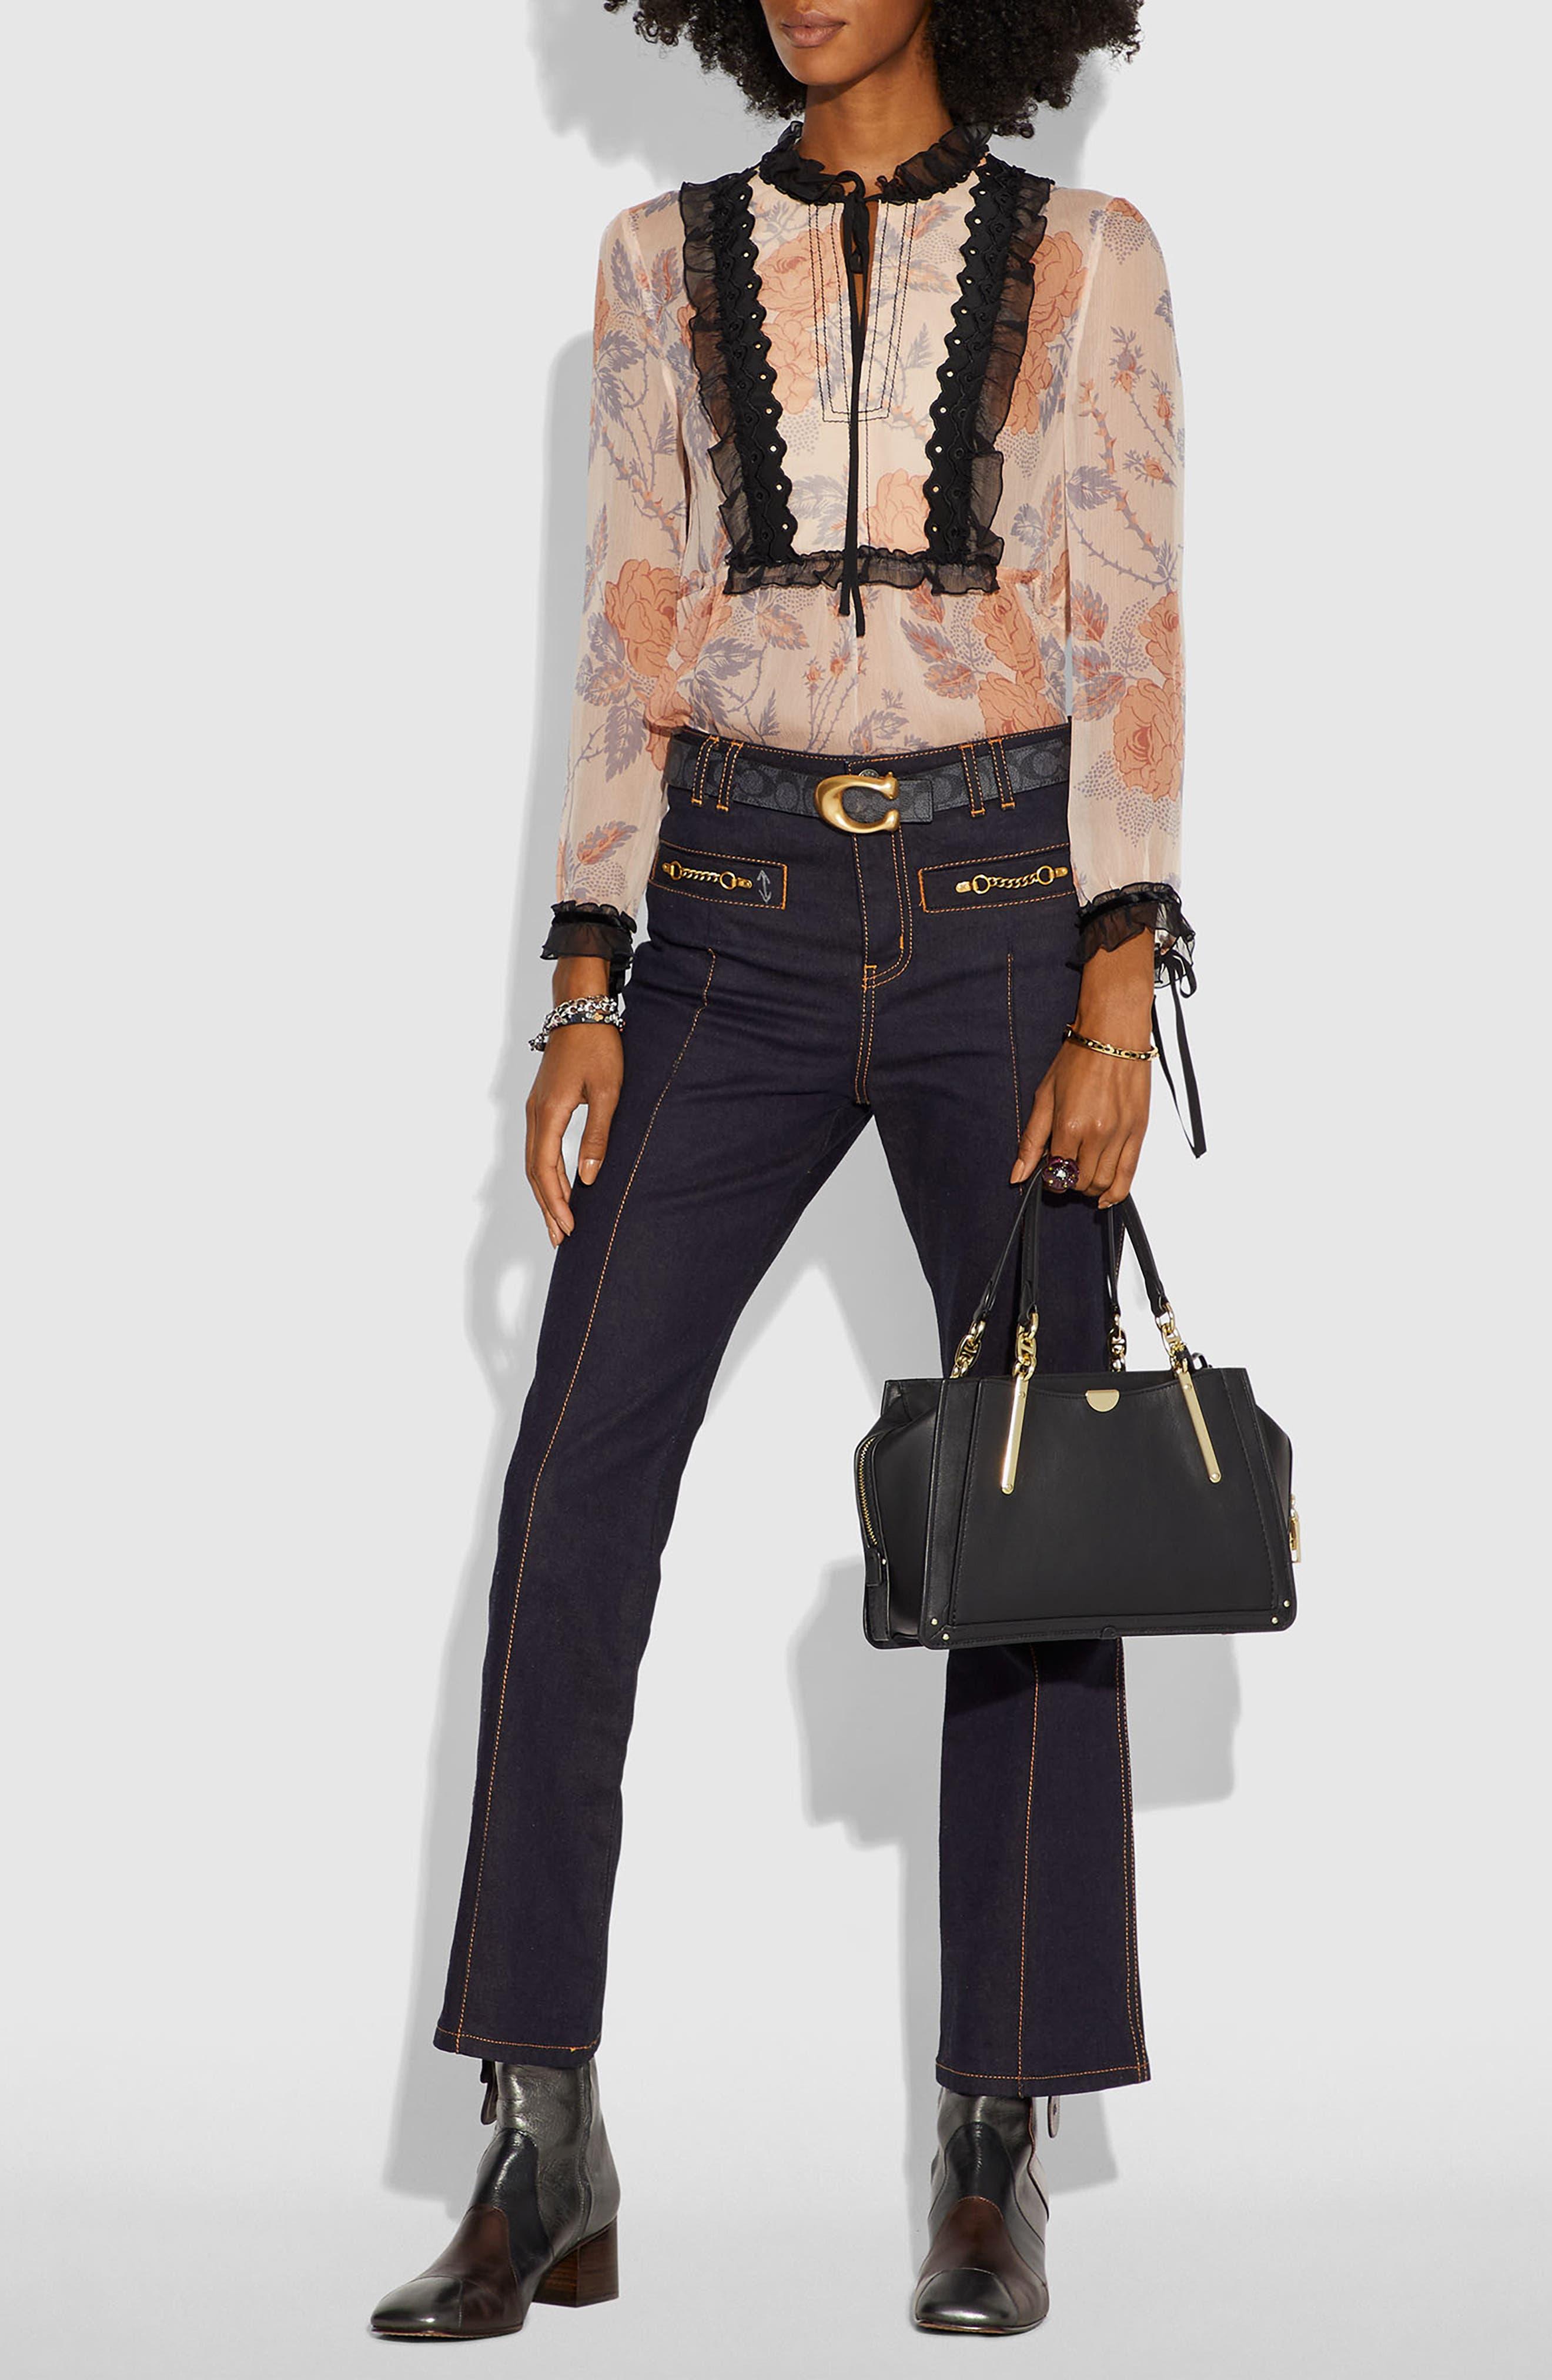 COACH,                             Dreamer Leather Bag,                             Alternate thumbnail 2, color,                             BLACK